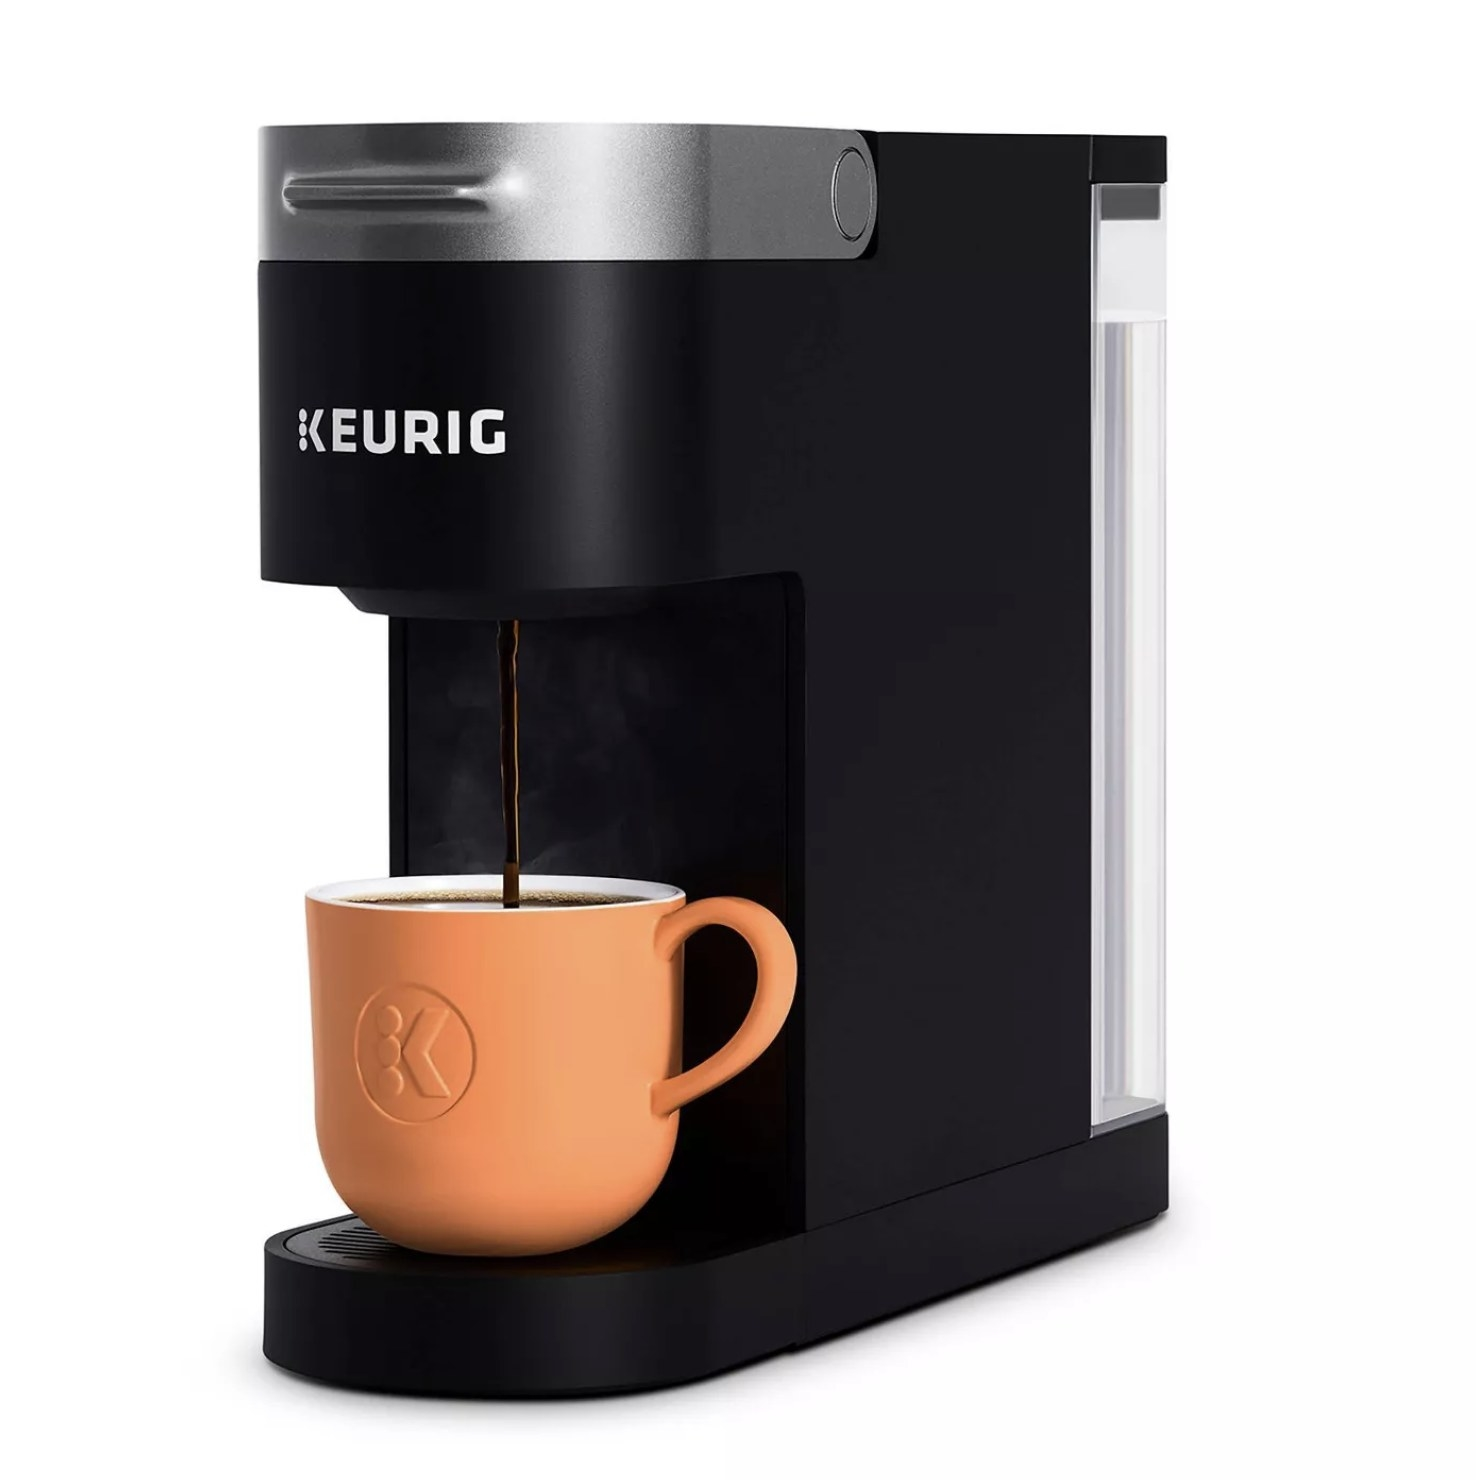 A black Keurig Slim k-cup coffee maker pouring coffee into an orange mug